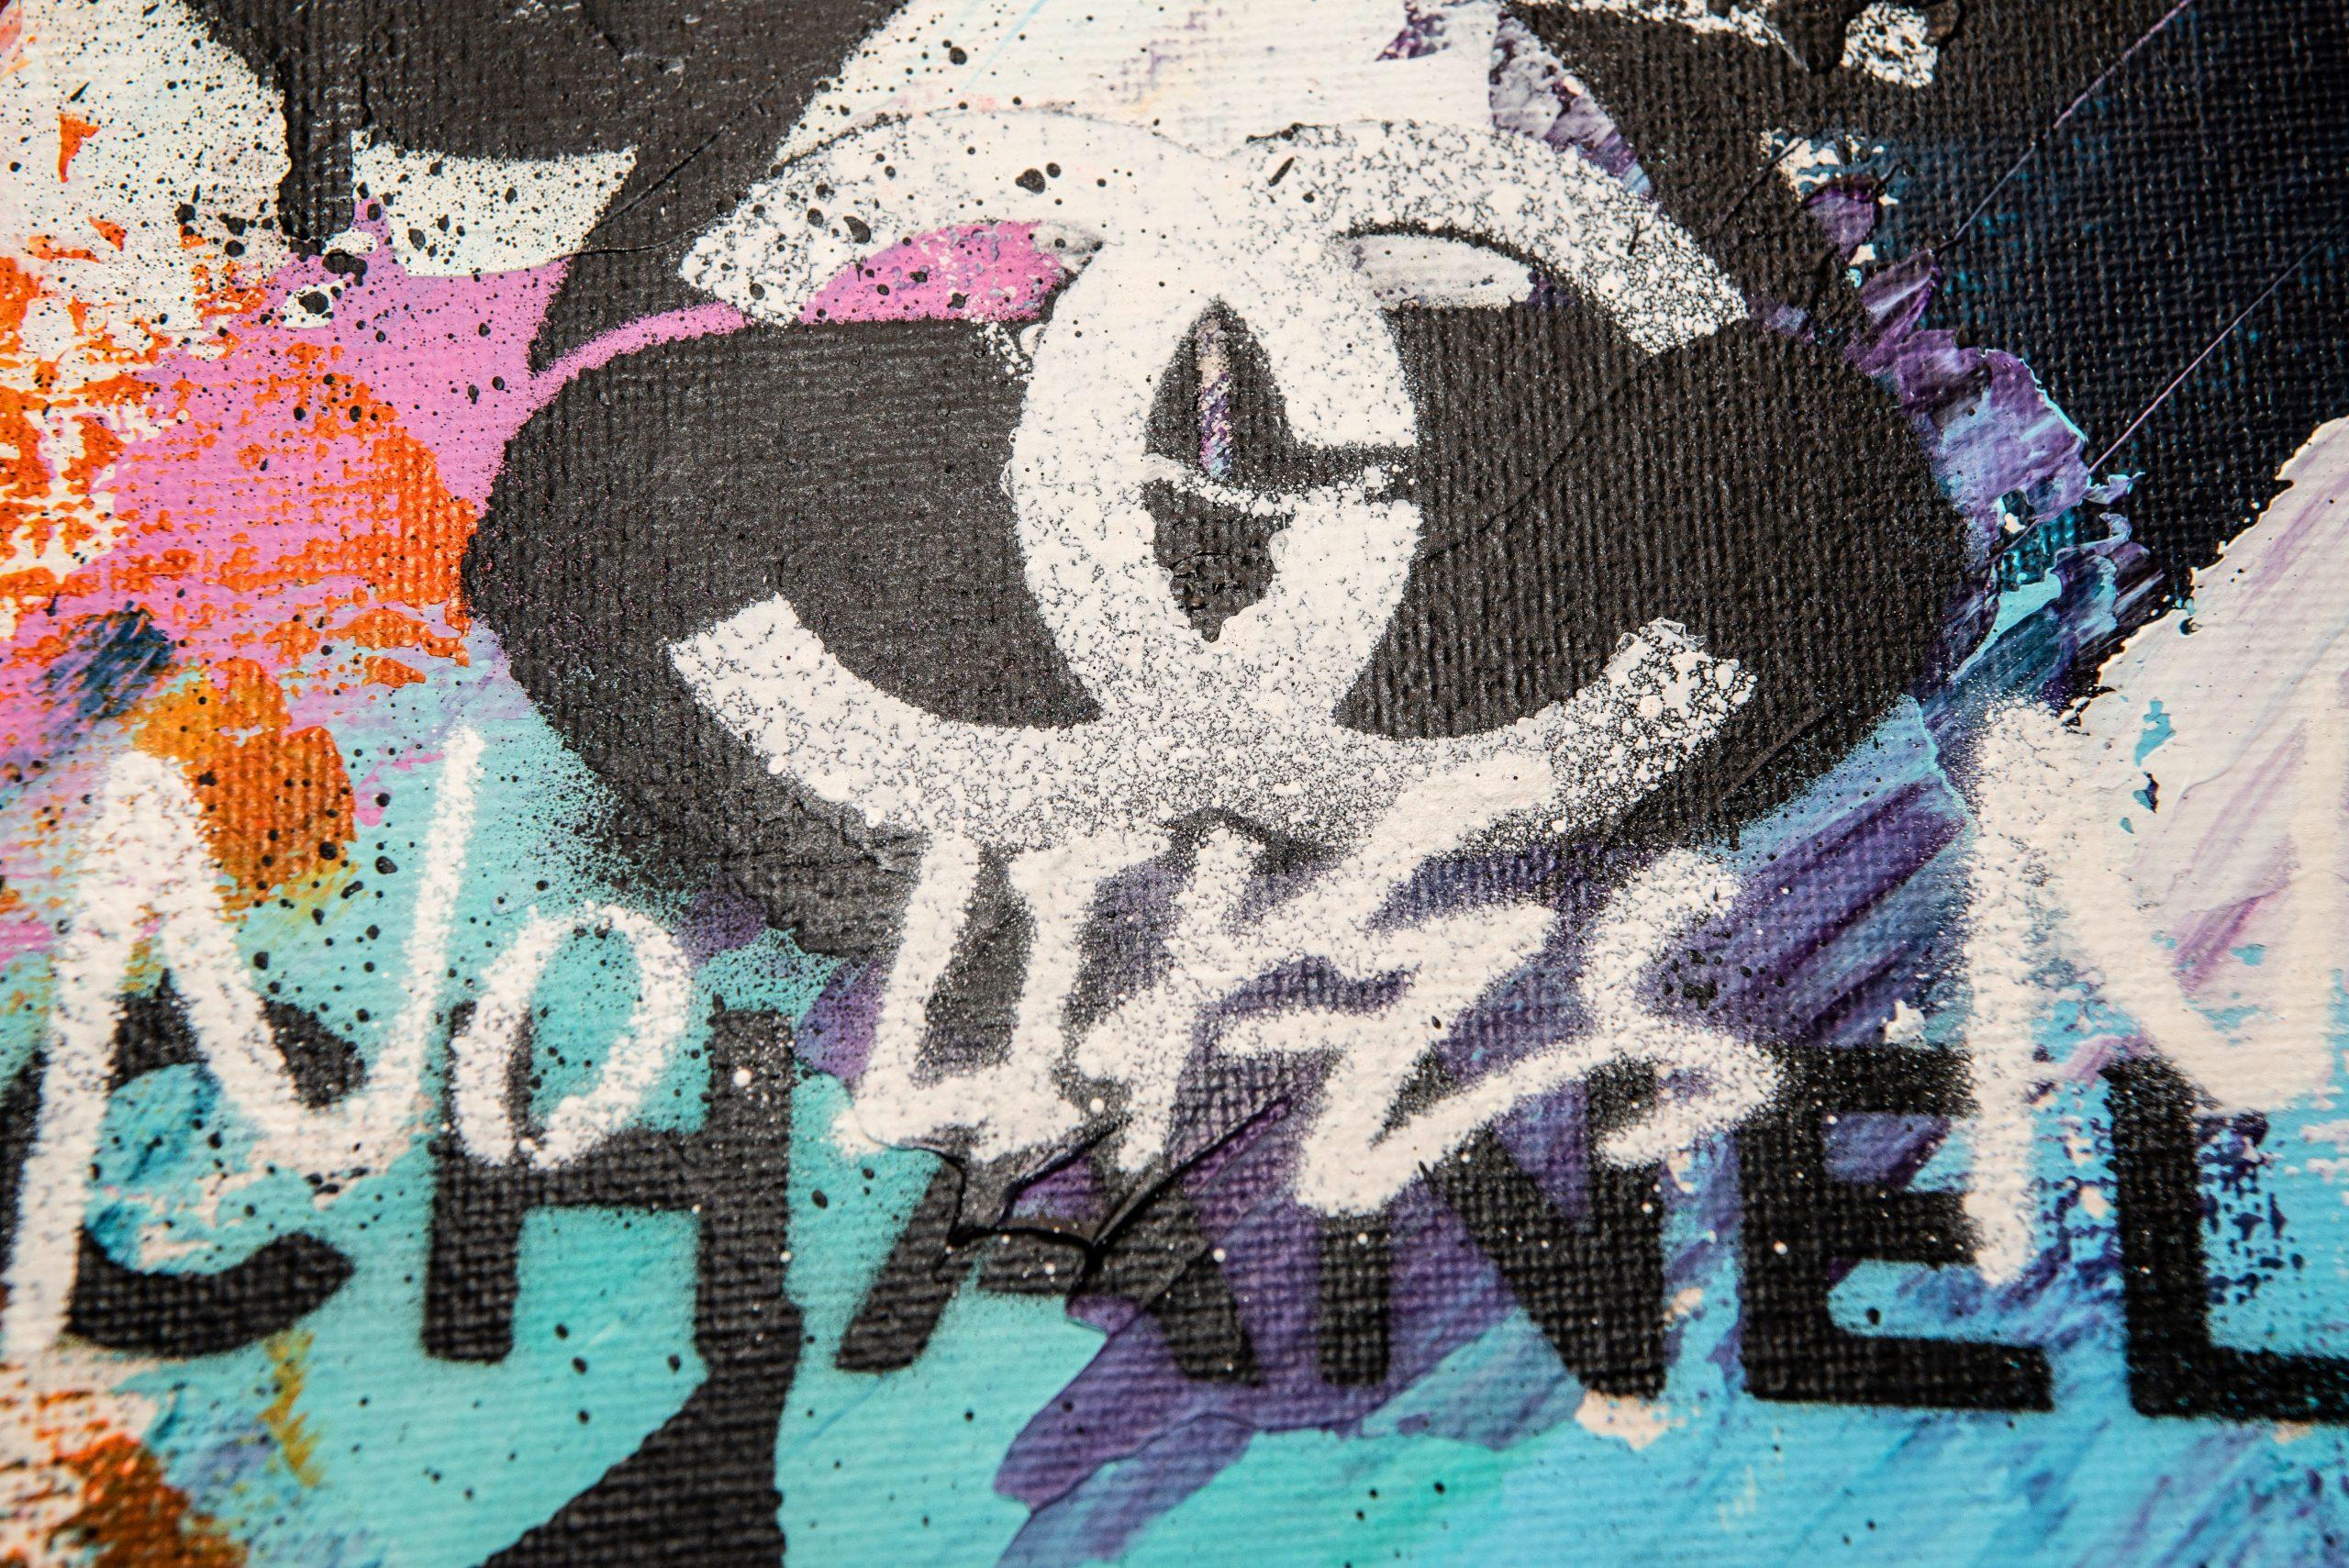 NATALIE-OTALORA-ART-NO-LIKES-NO-CHANEL-GRAFFITI-PAINTING-DETAIL1